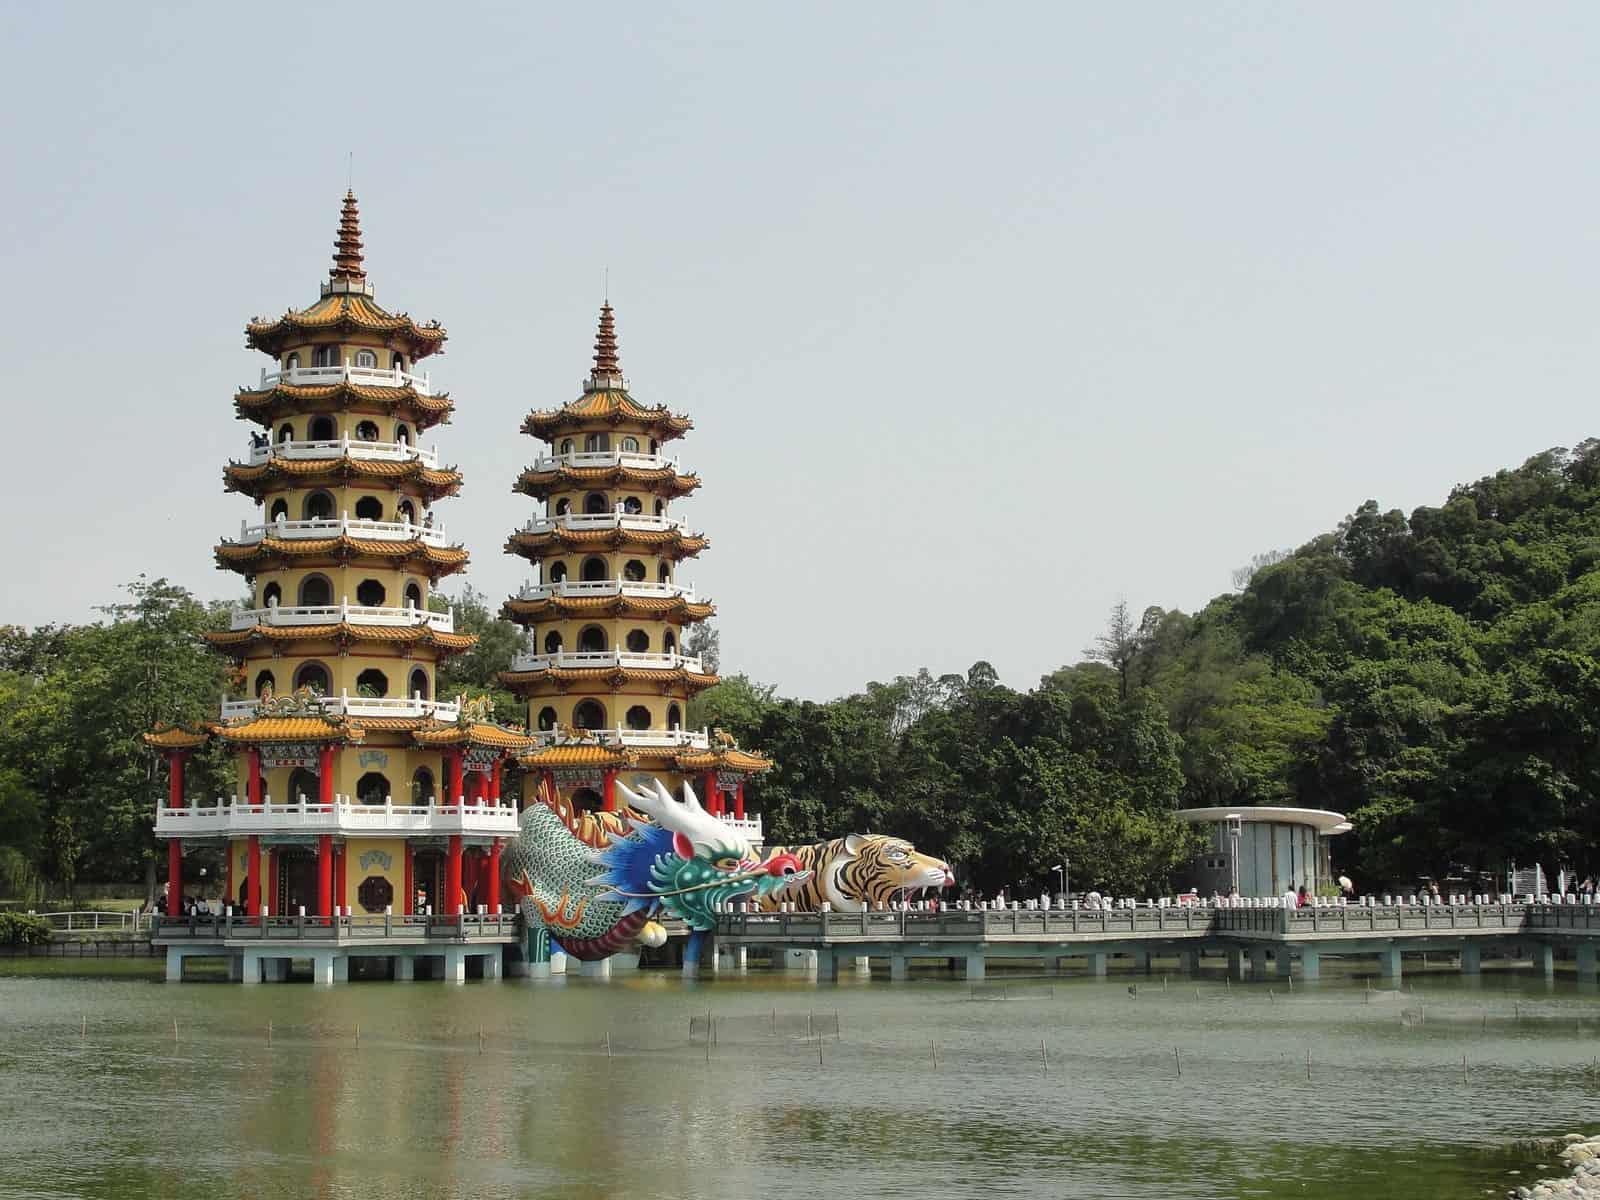 Lotus Pond in Kaohsiung, Taiwan